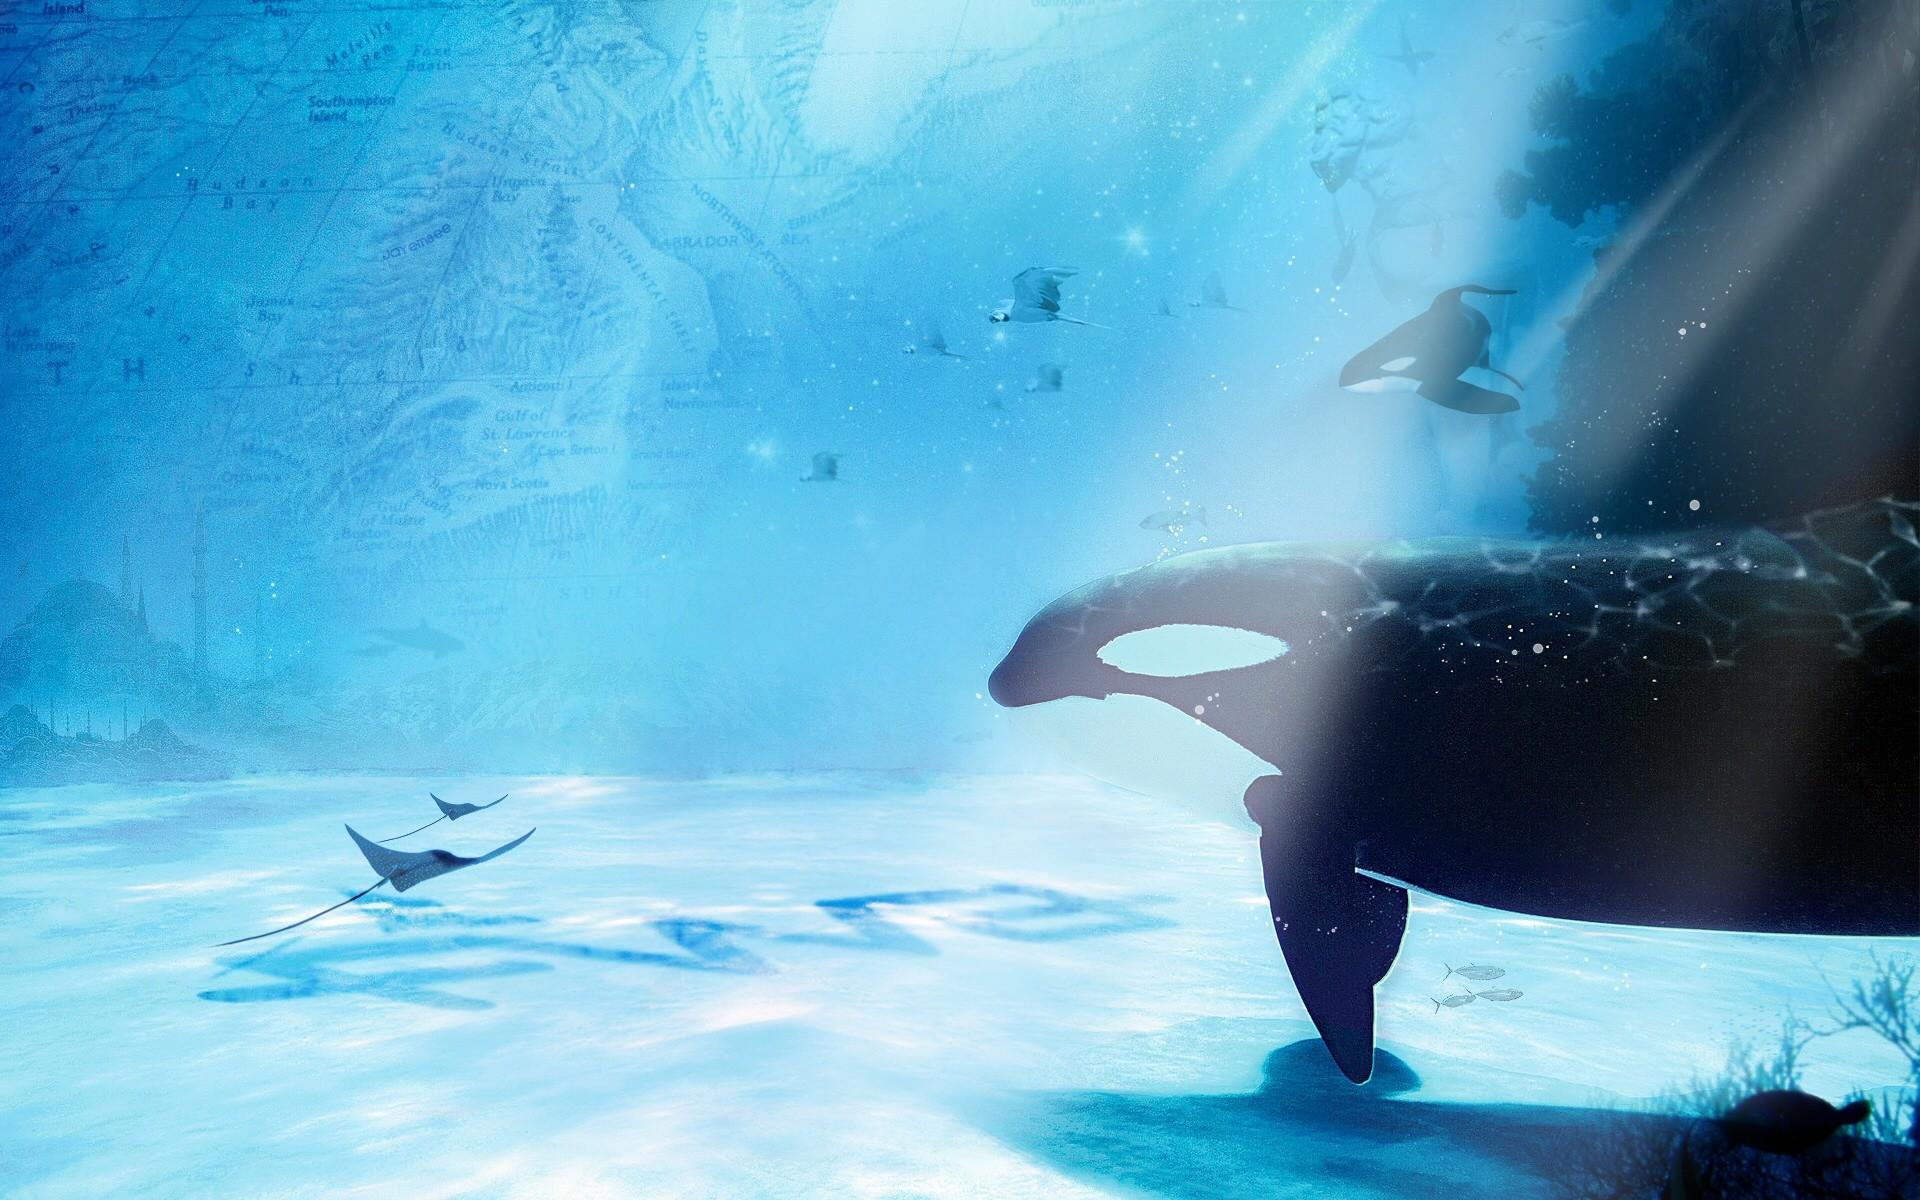 Res: 1920x1200, animals, wallpapers, sea, freeandroid, sealife, ocean, display, art,  whales, ray, free, manta, sunlight, underwater, cg, life, sting,  digital,_ ...